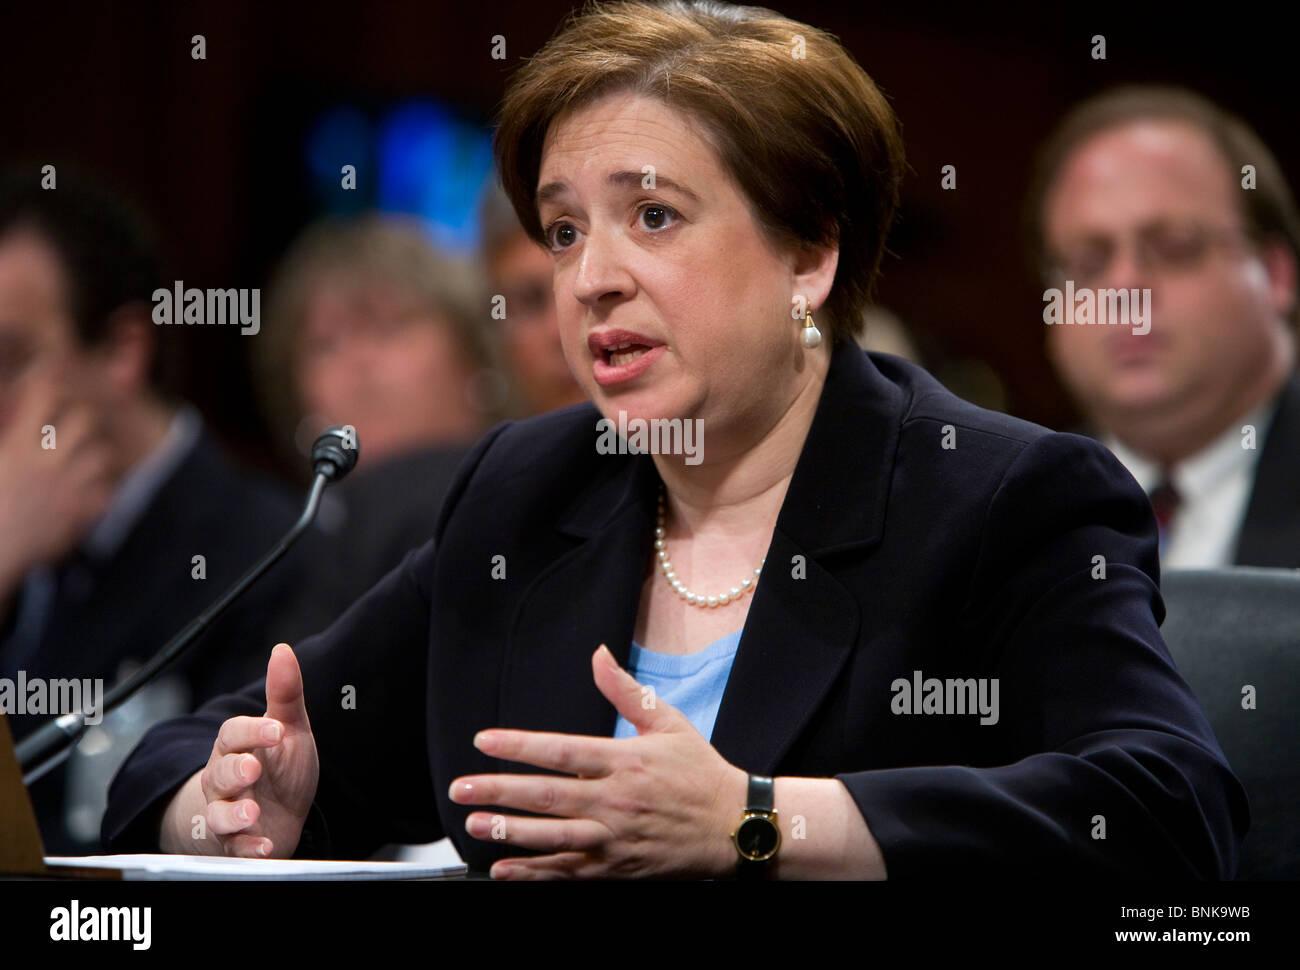 Supreme Court Justice Elena Kagan.  - Stock Image